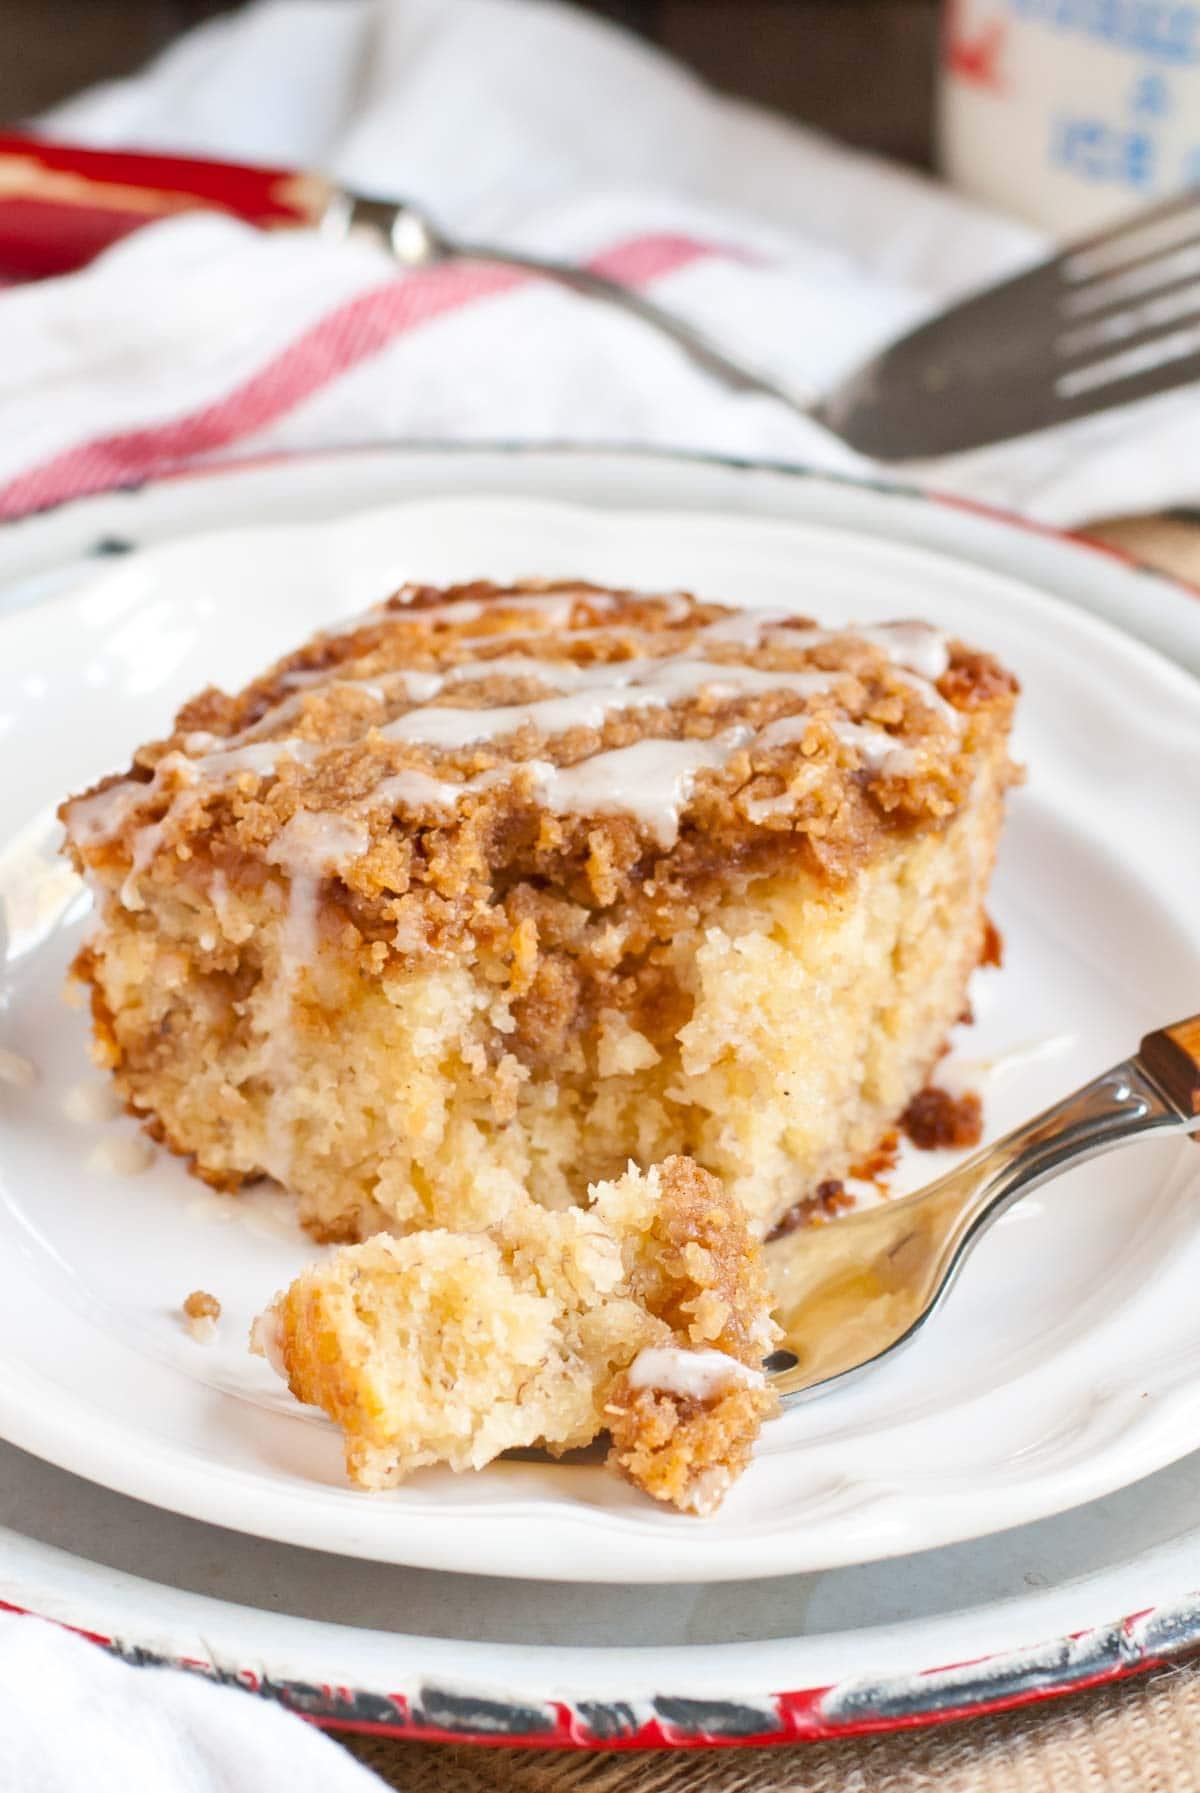 This amazing Banana Crumb Cake has a crunchy brown sugar crumb topping and ultra moist cinnamon banana cake.